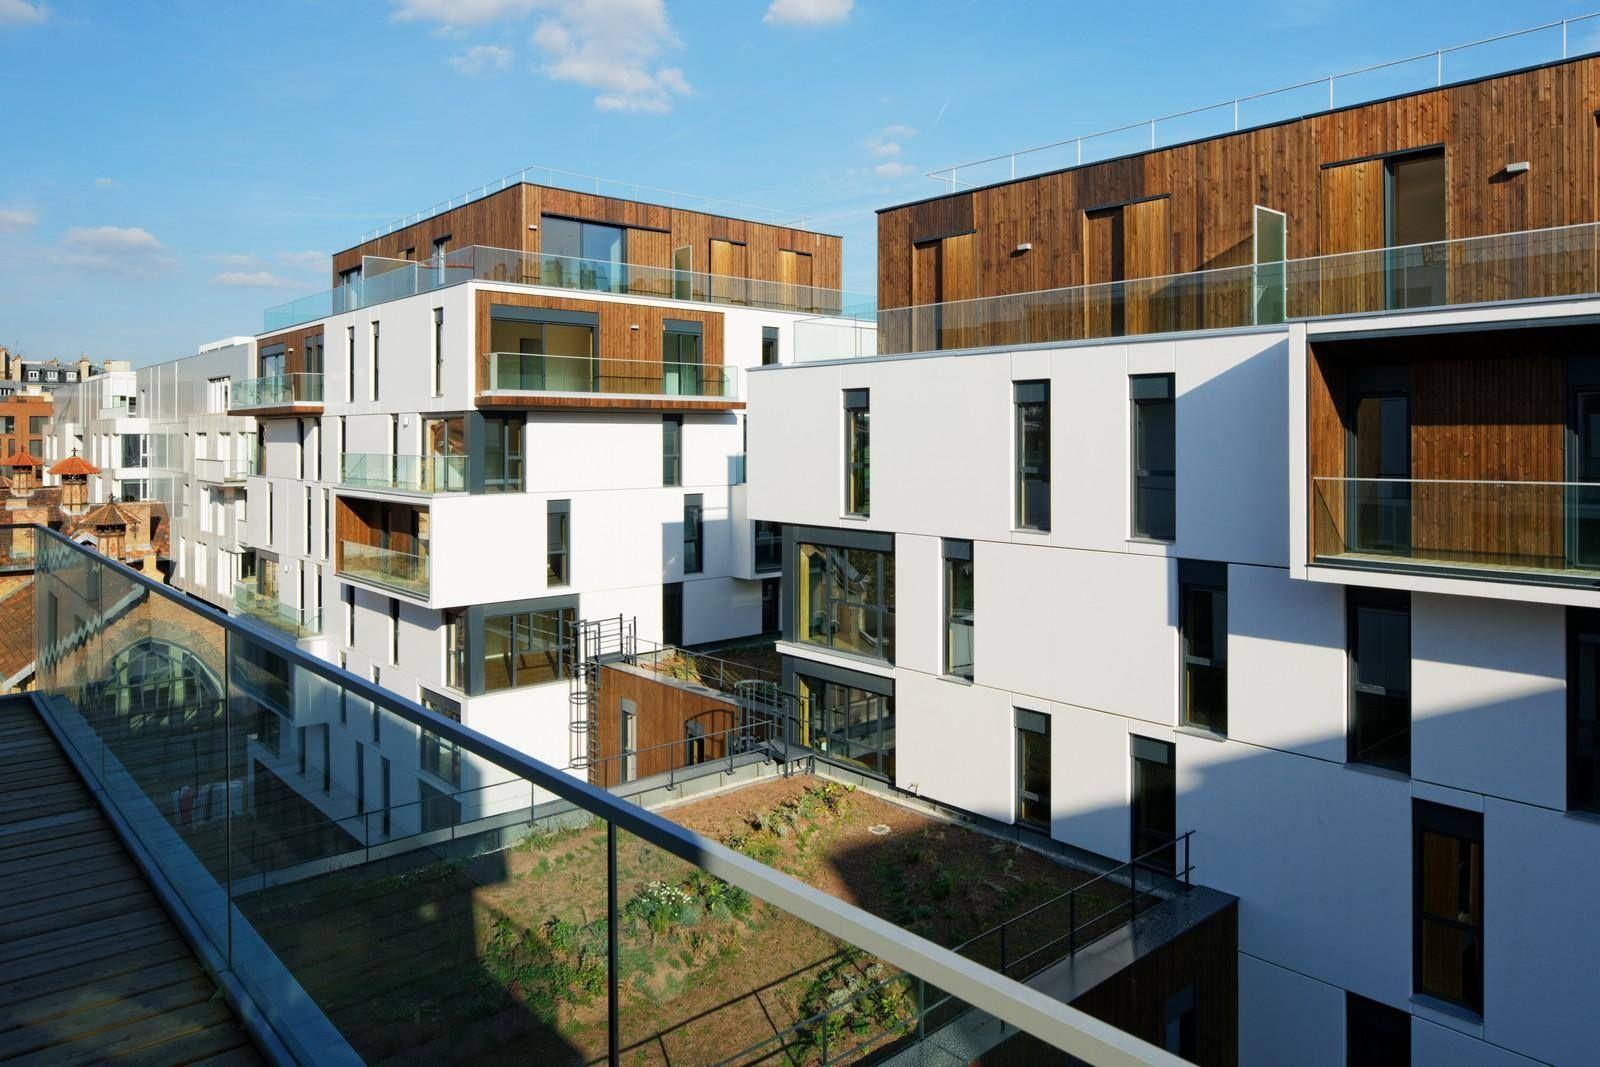 pin by doris on architecture wohnungsbau mehrfamilienh user loggia balkon. Black Bedroom Furniture Sets. Home Design Ideas